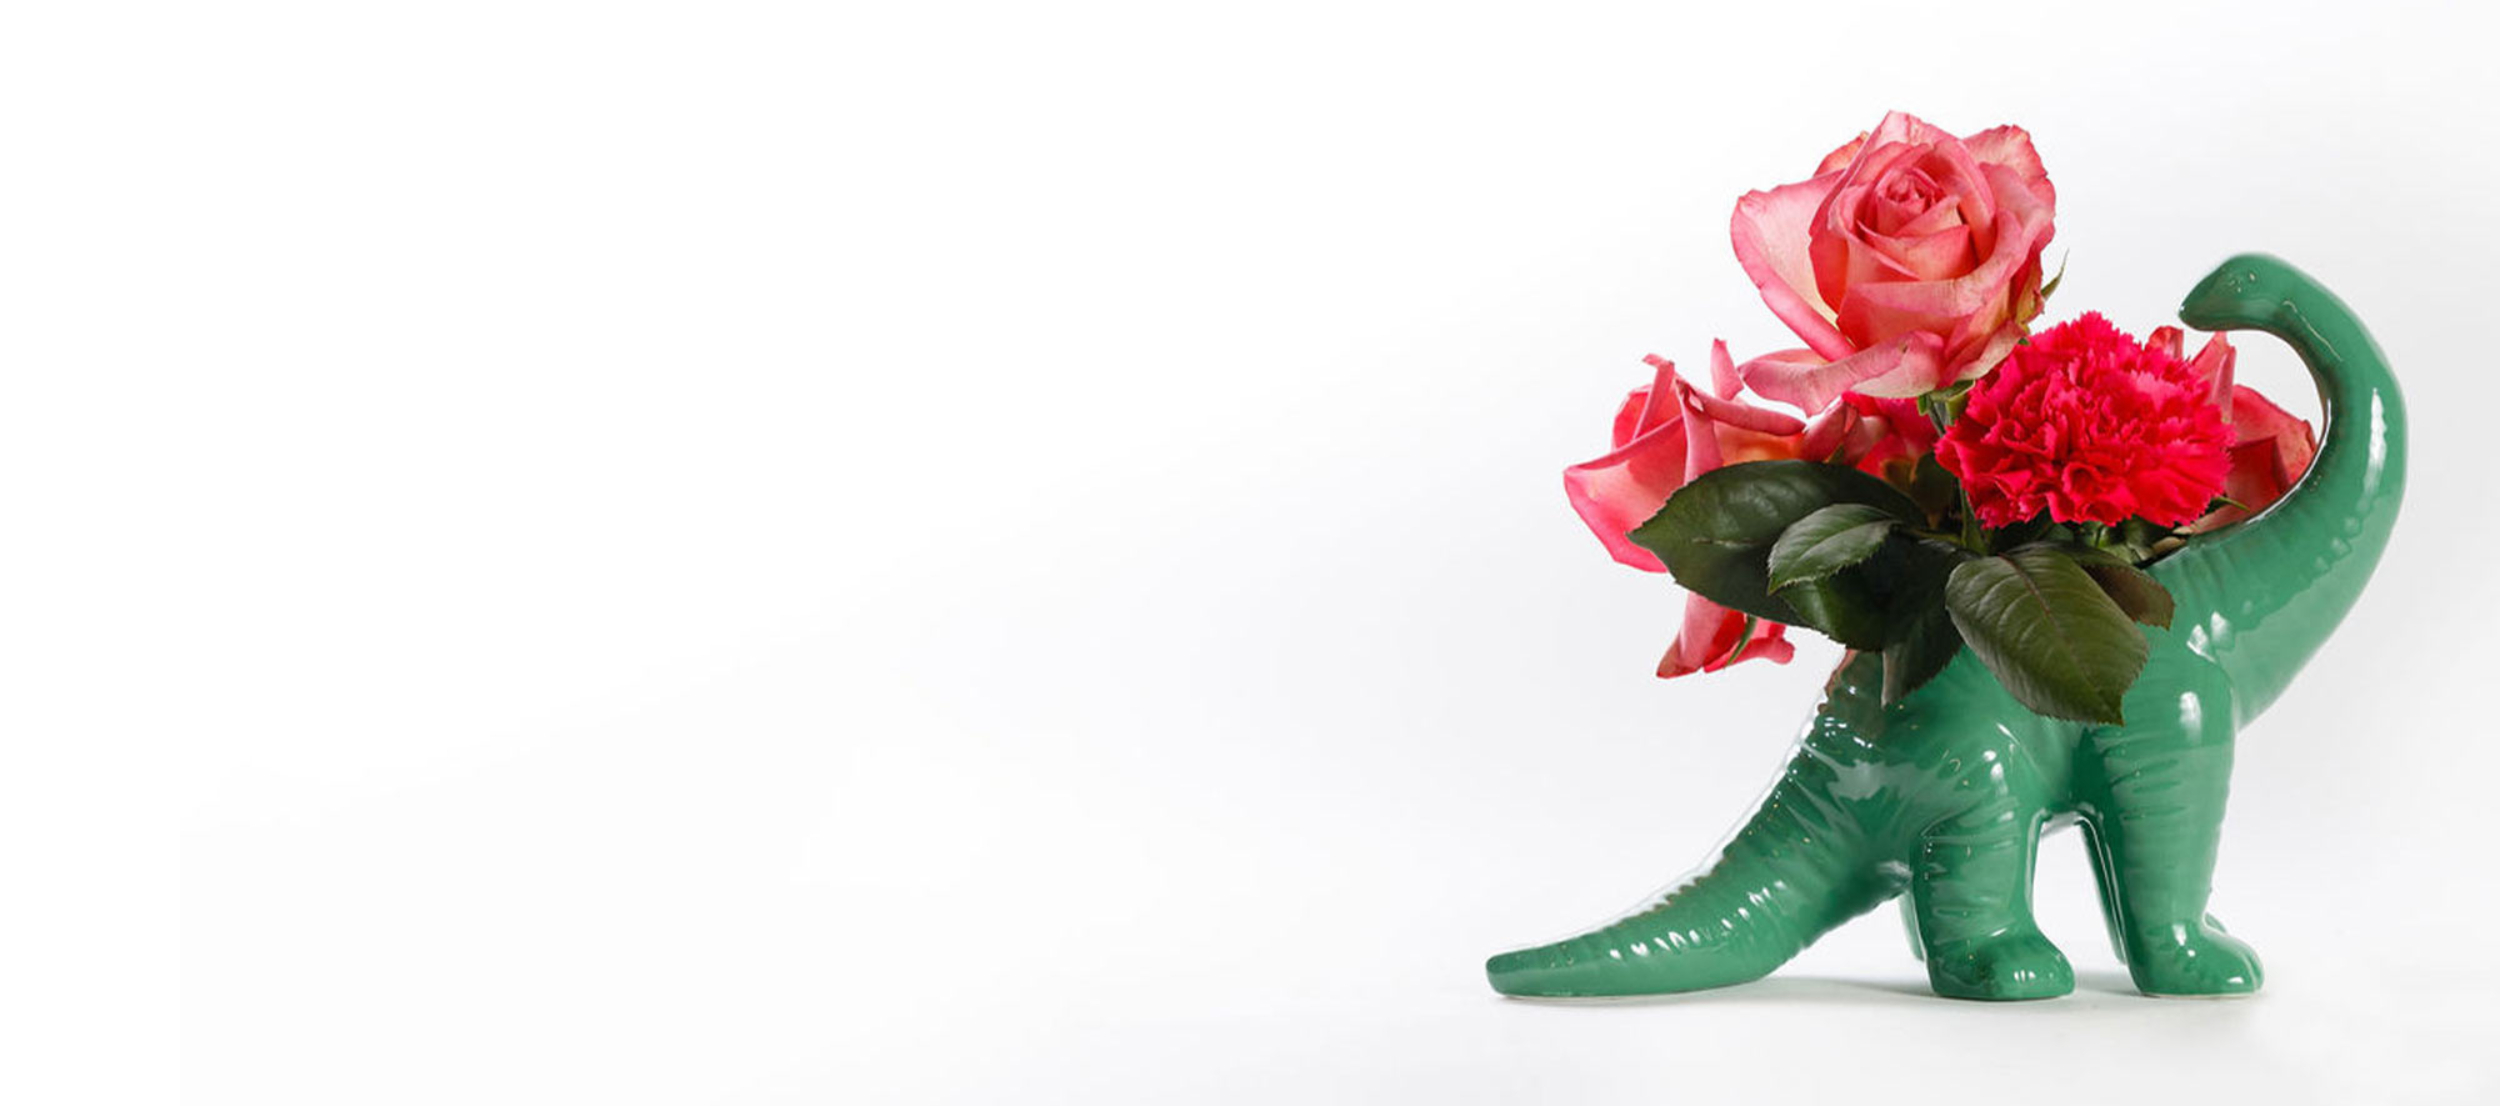 Dinosaur Vase with Floral Arrangement